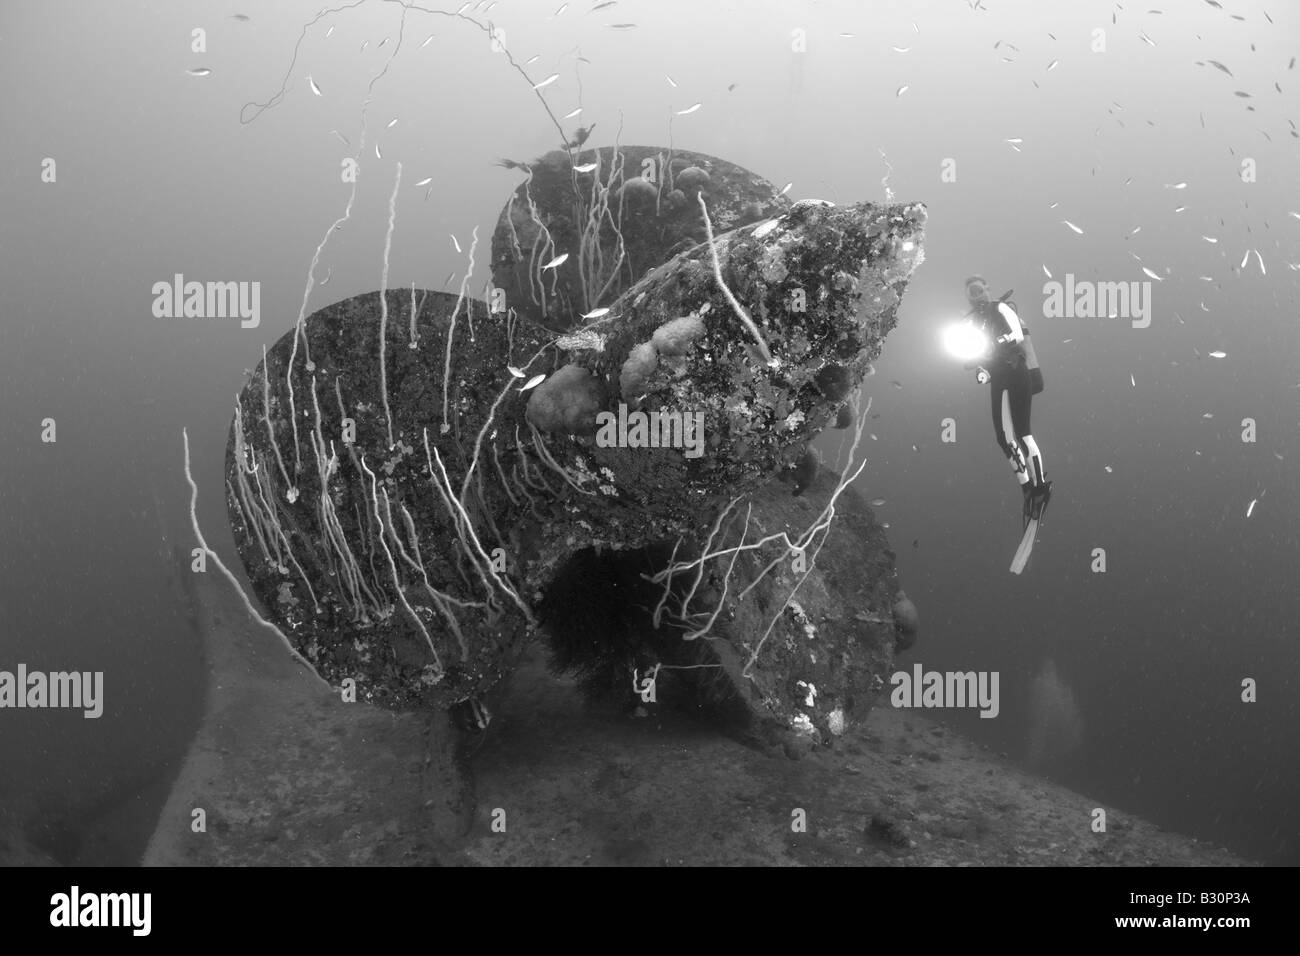 Diver at Propellers of HIJMS Nagato Battleship Marshall Islands Bikini Atoll Micronesia Pacific Ocean - Stock Image